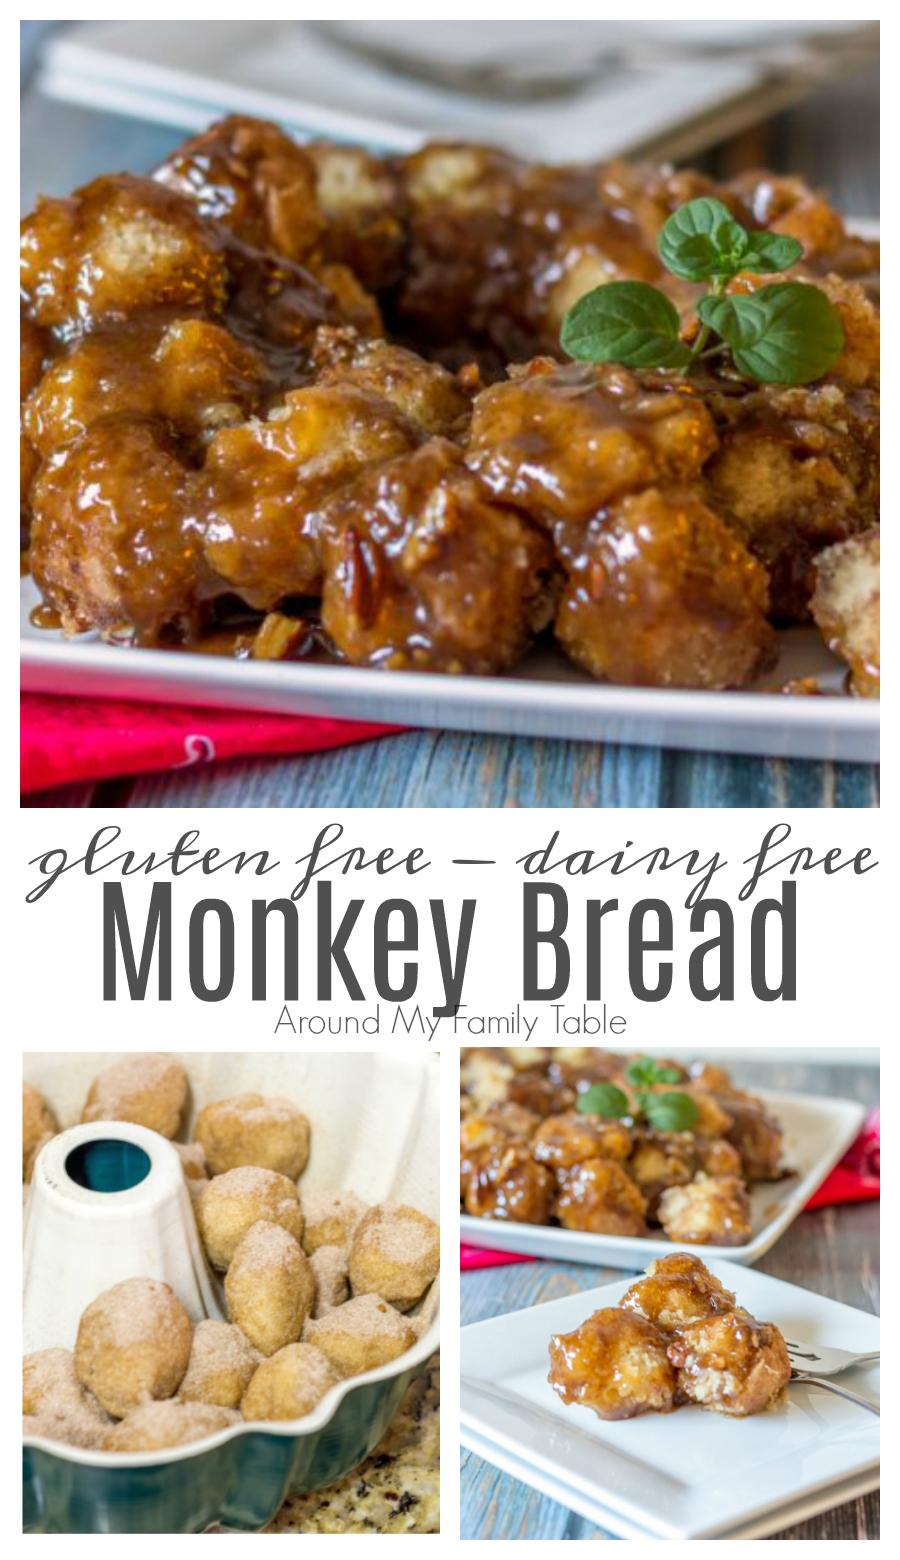 Gluten Free Monkey Bread is a classic sticky sweet breakfast treat, perfect for a weekend brunch! Plus it's Dairy Free too! via @slingmama